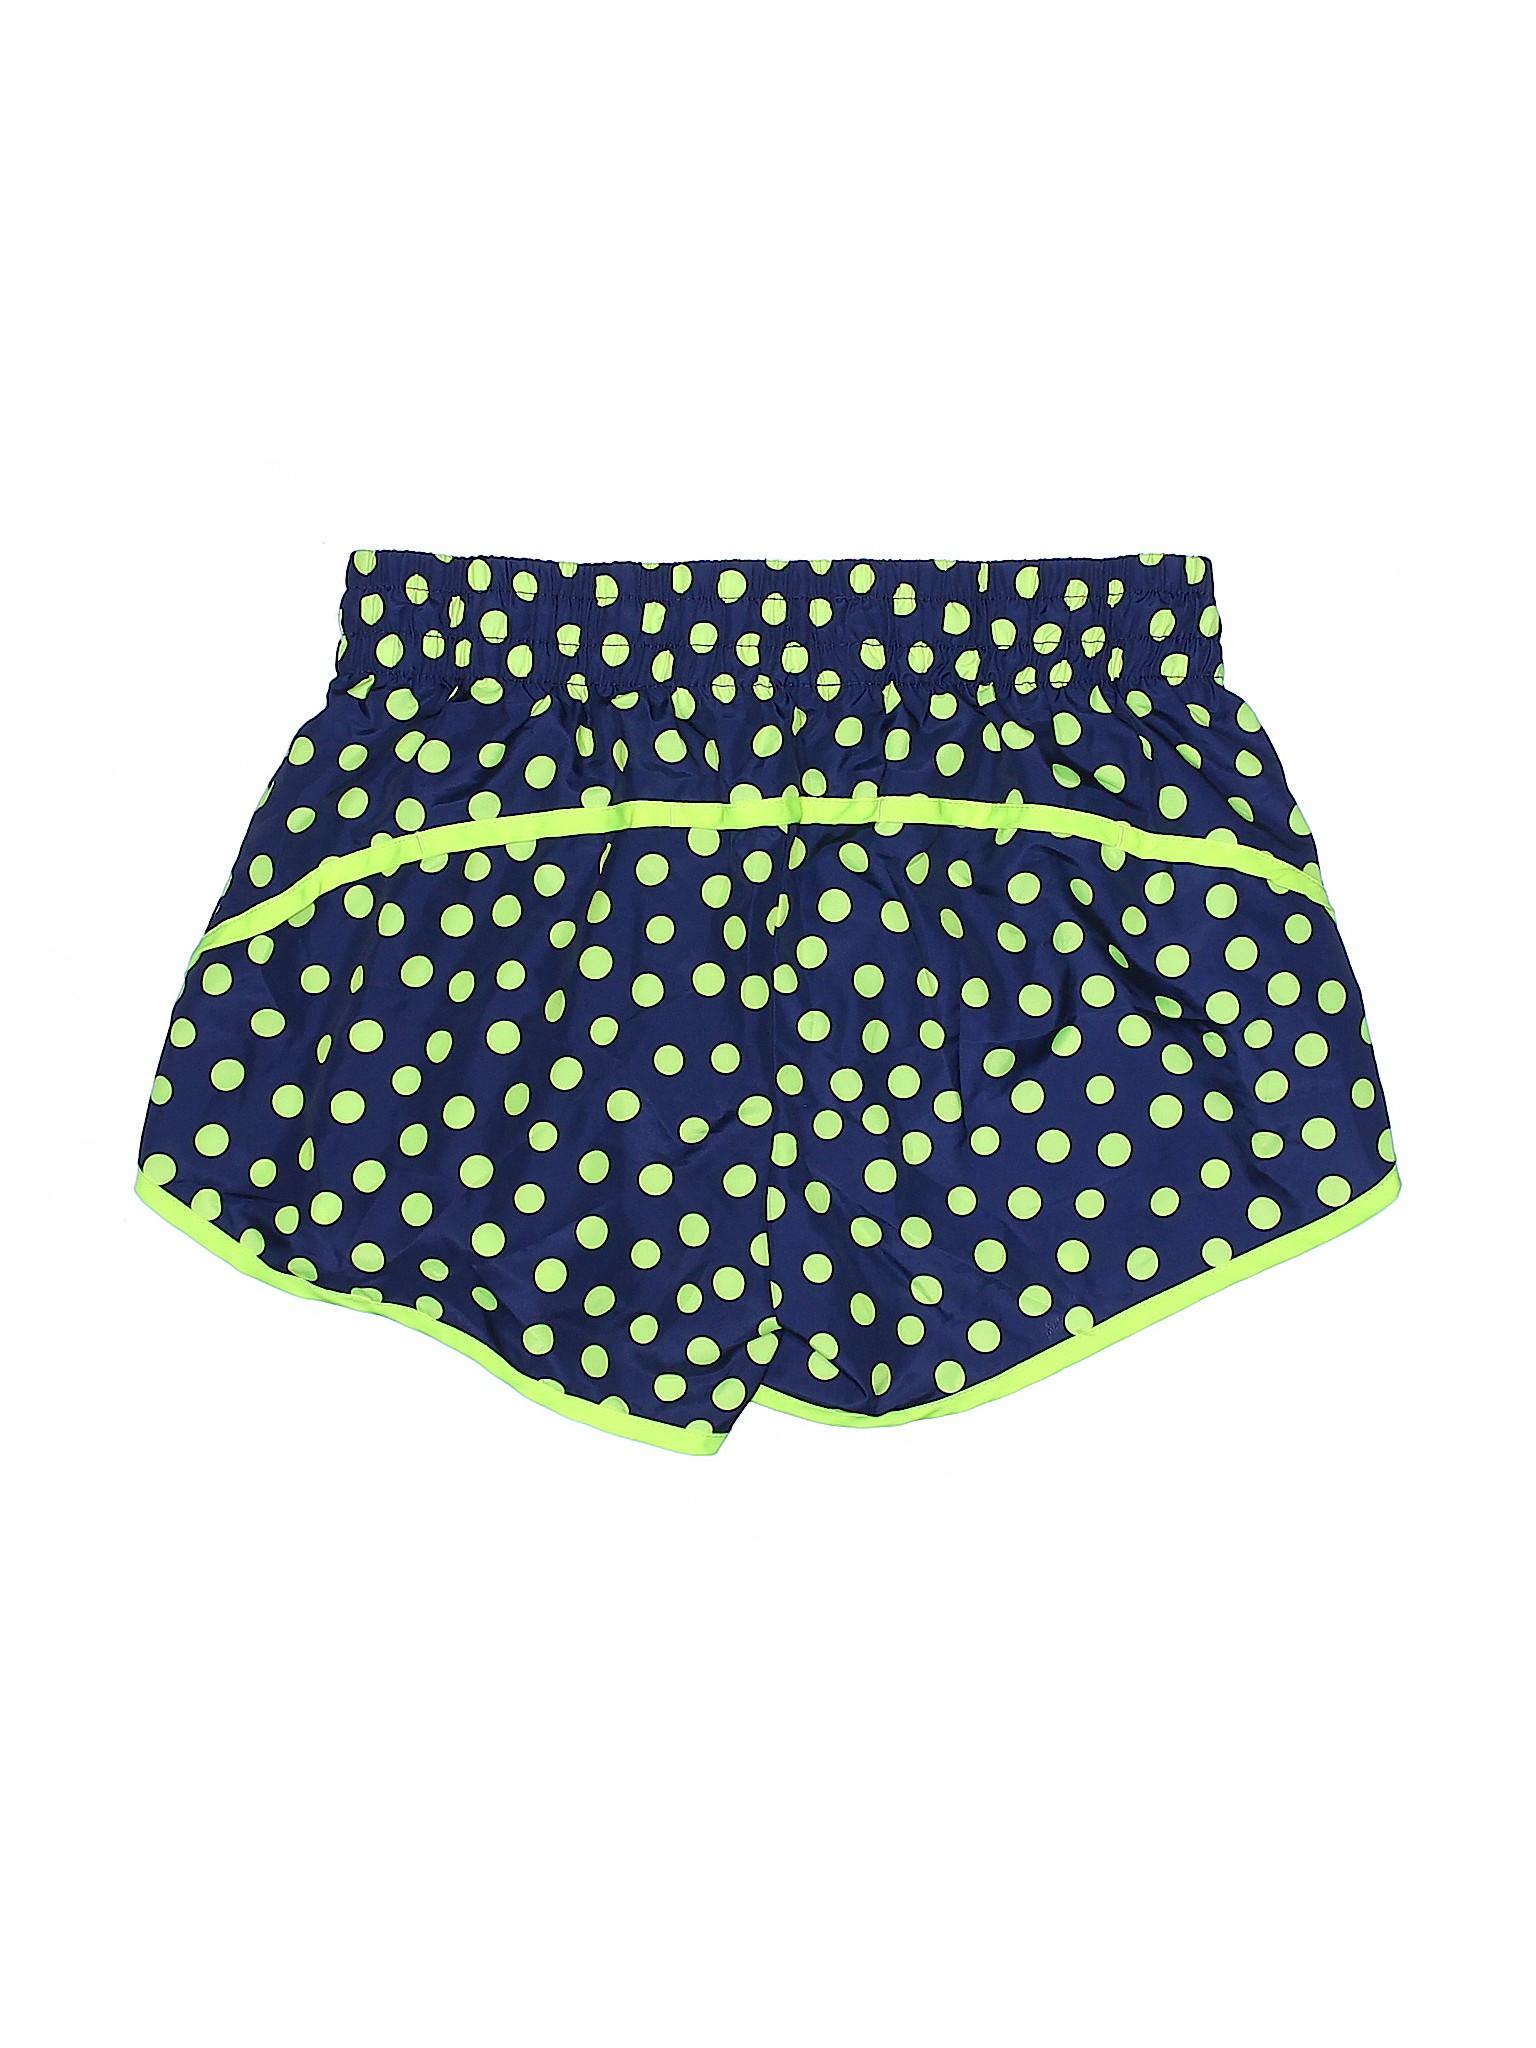 Athletic Boutique Shorts Now Danskin winter YAxxwTzqC